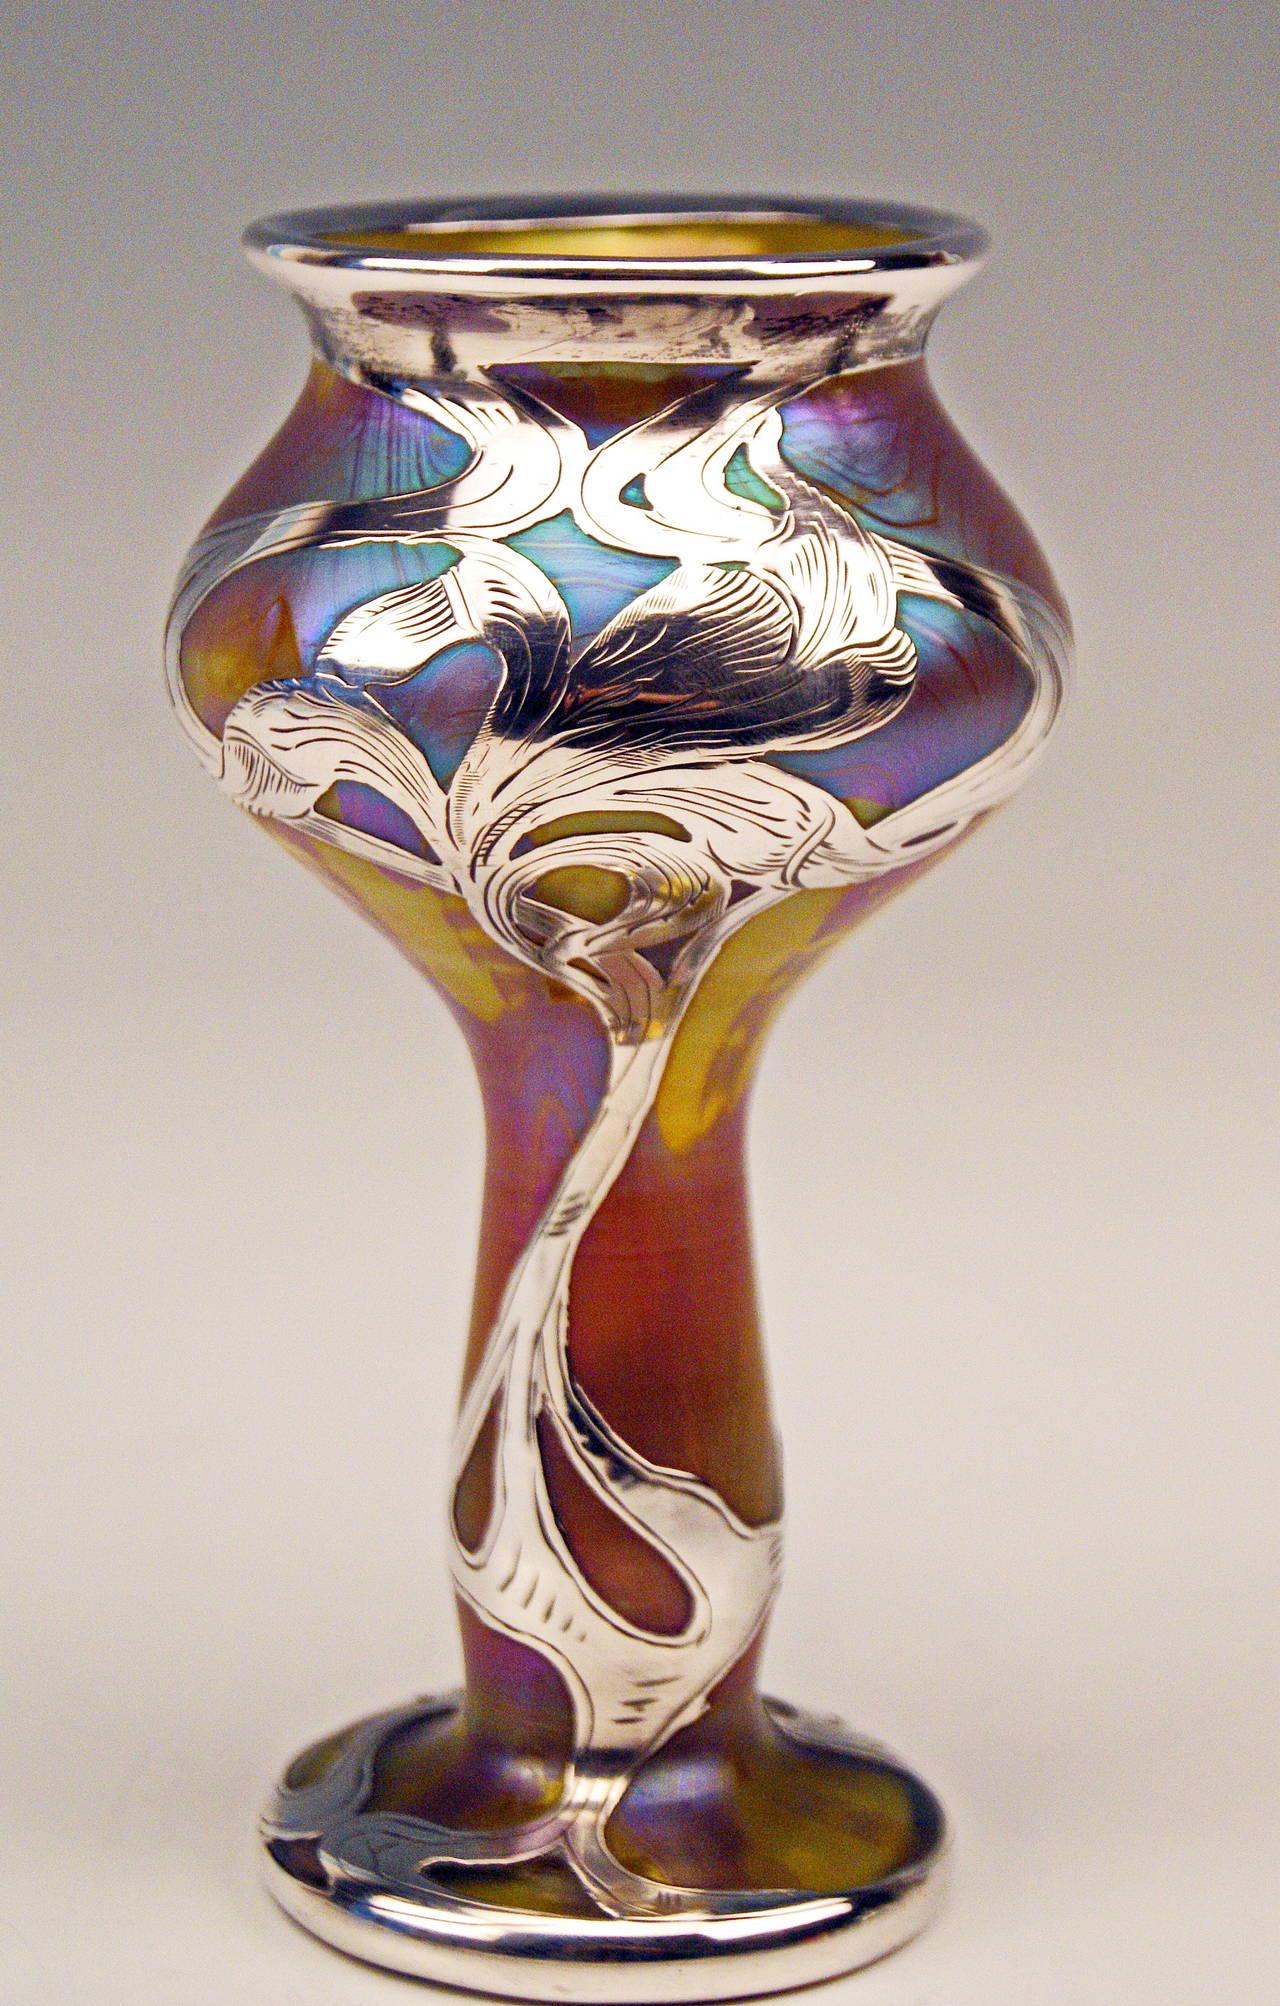 Early 20th Century Vase Loetz Widow Art Nouveau Phaenomen Gre Silver Overlay, circa 1900 For Sale